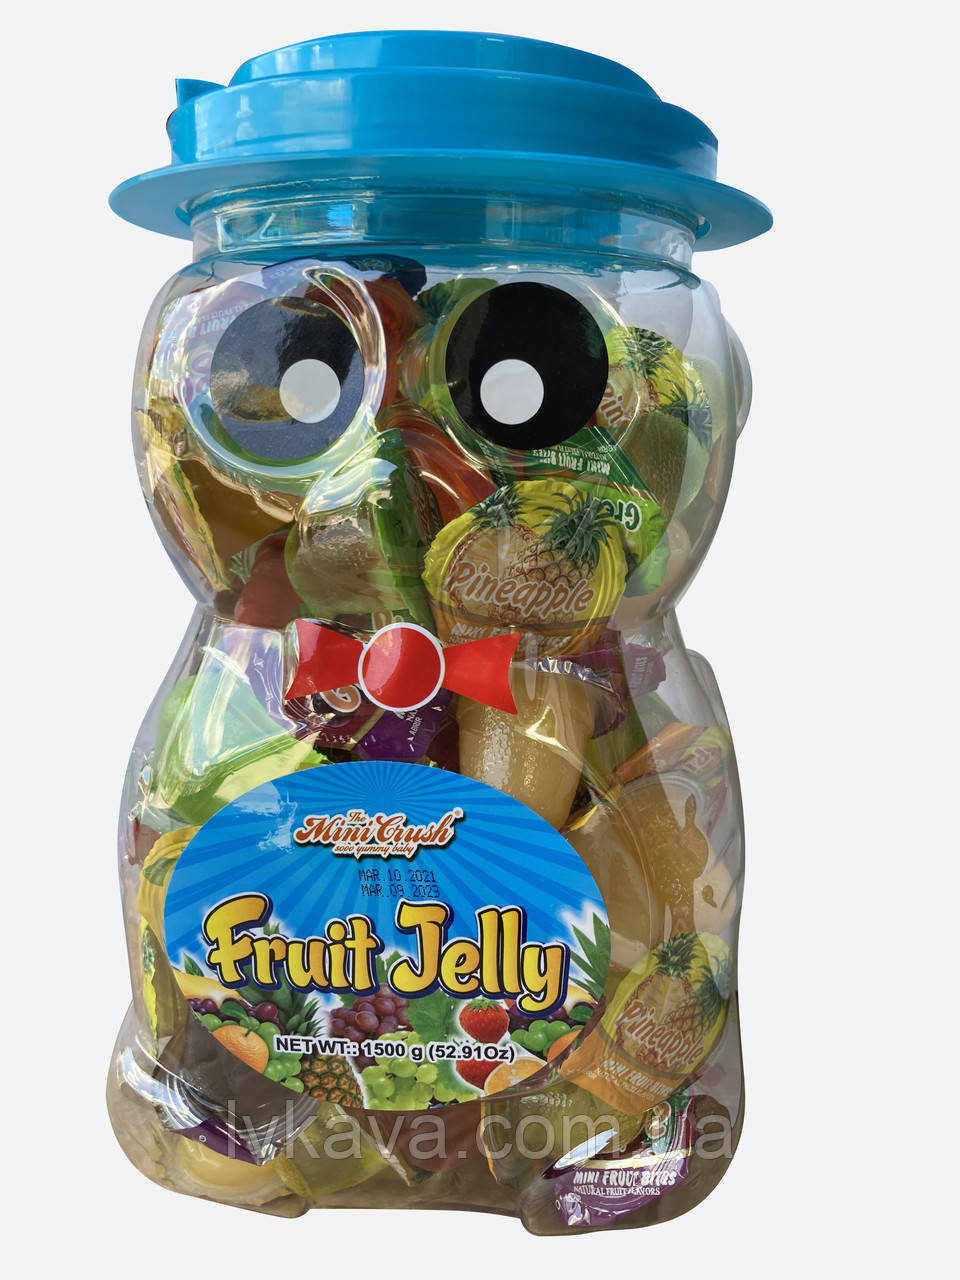 Фруктовое желе  Fruit Jelly  Медвежонок  Prestige , 100 шт